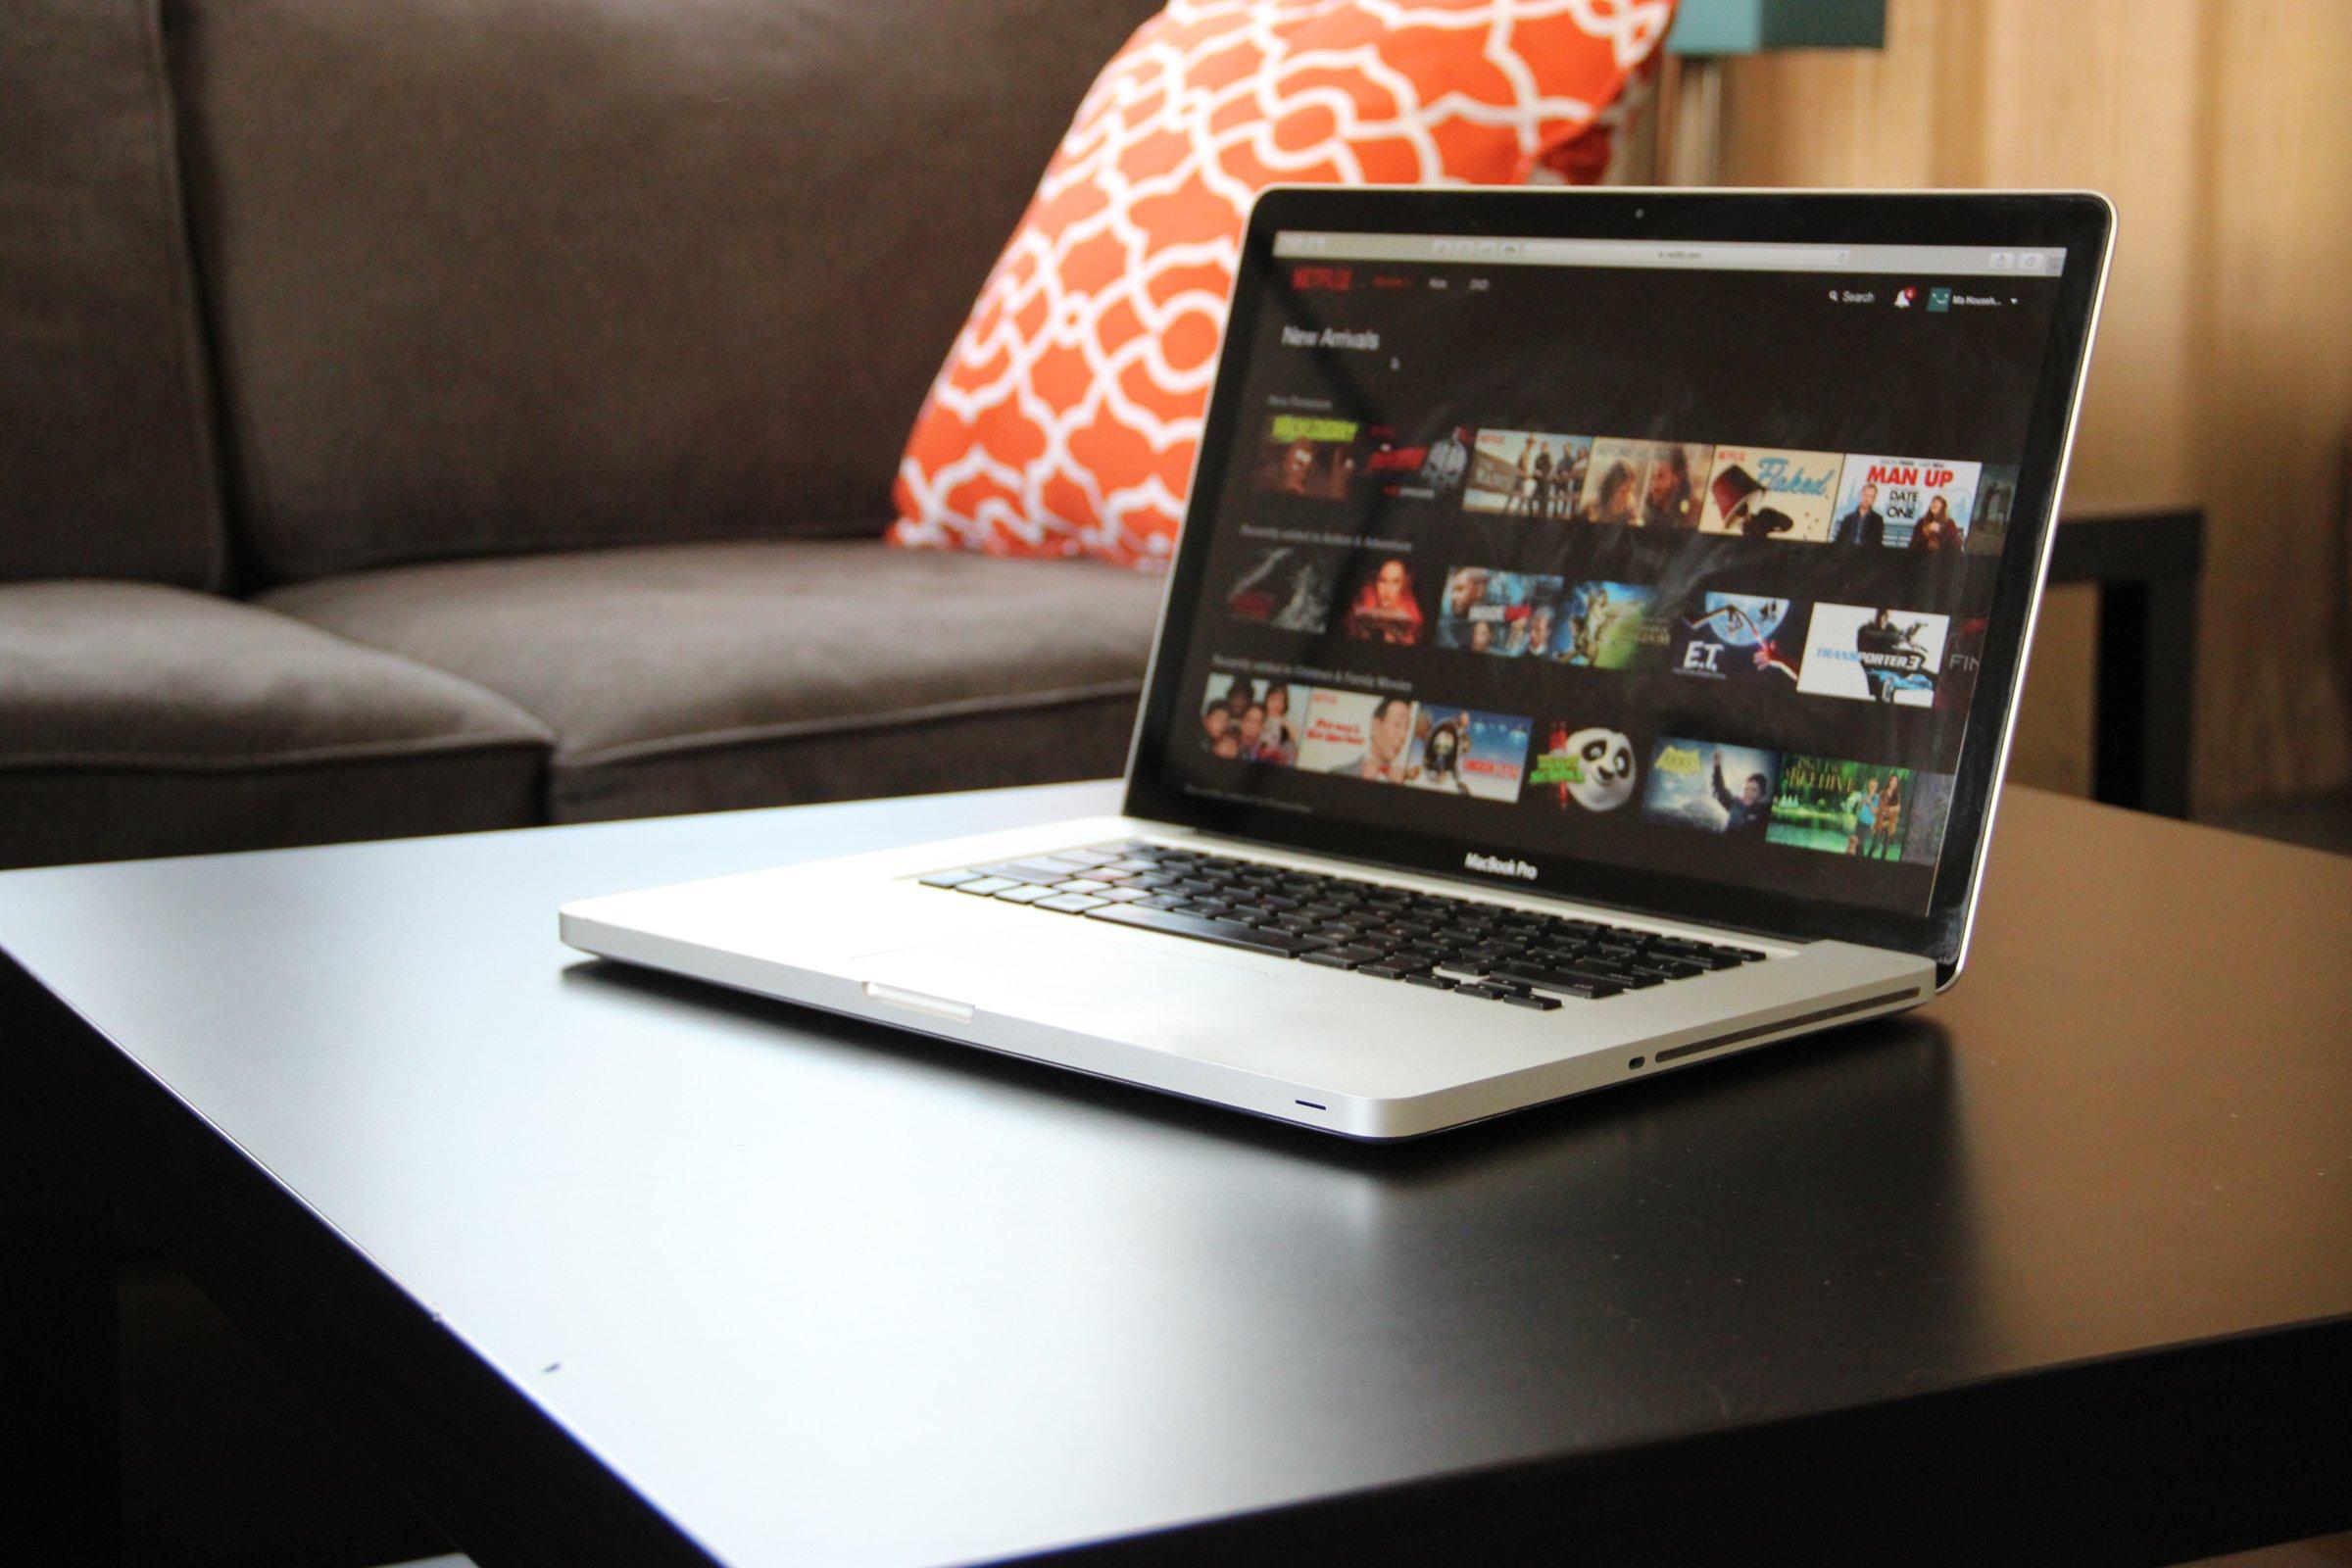 download netflix episodes on mac laptop